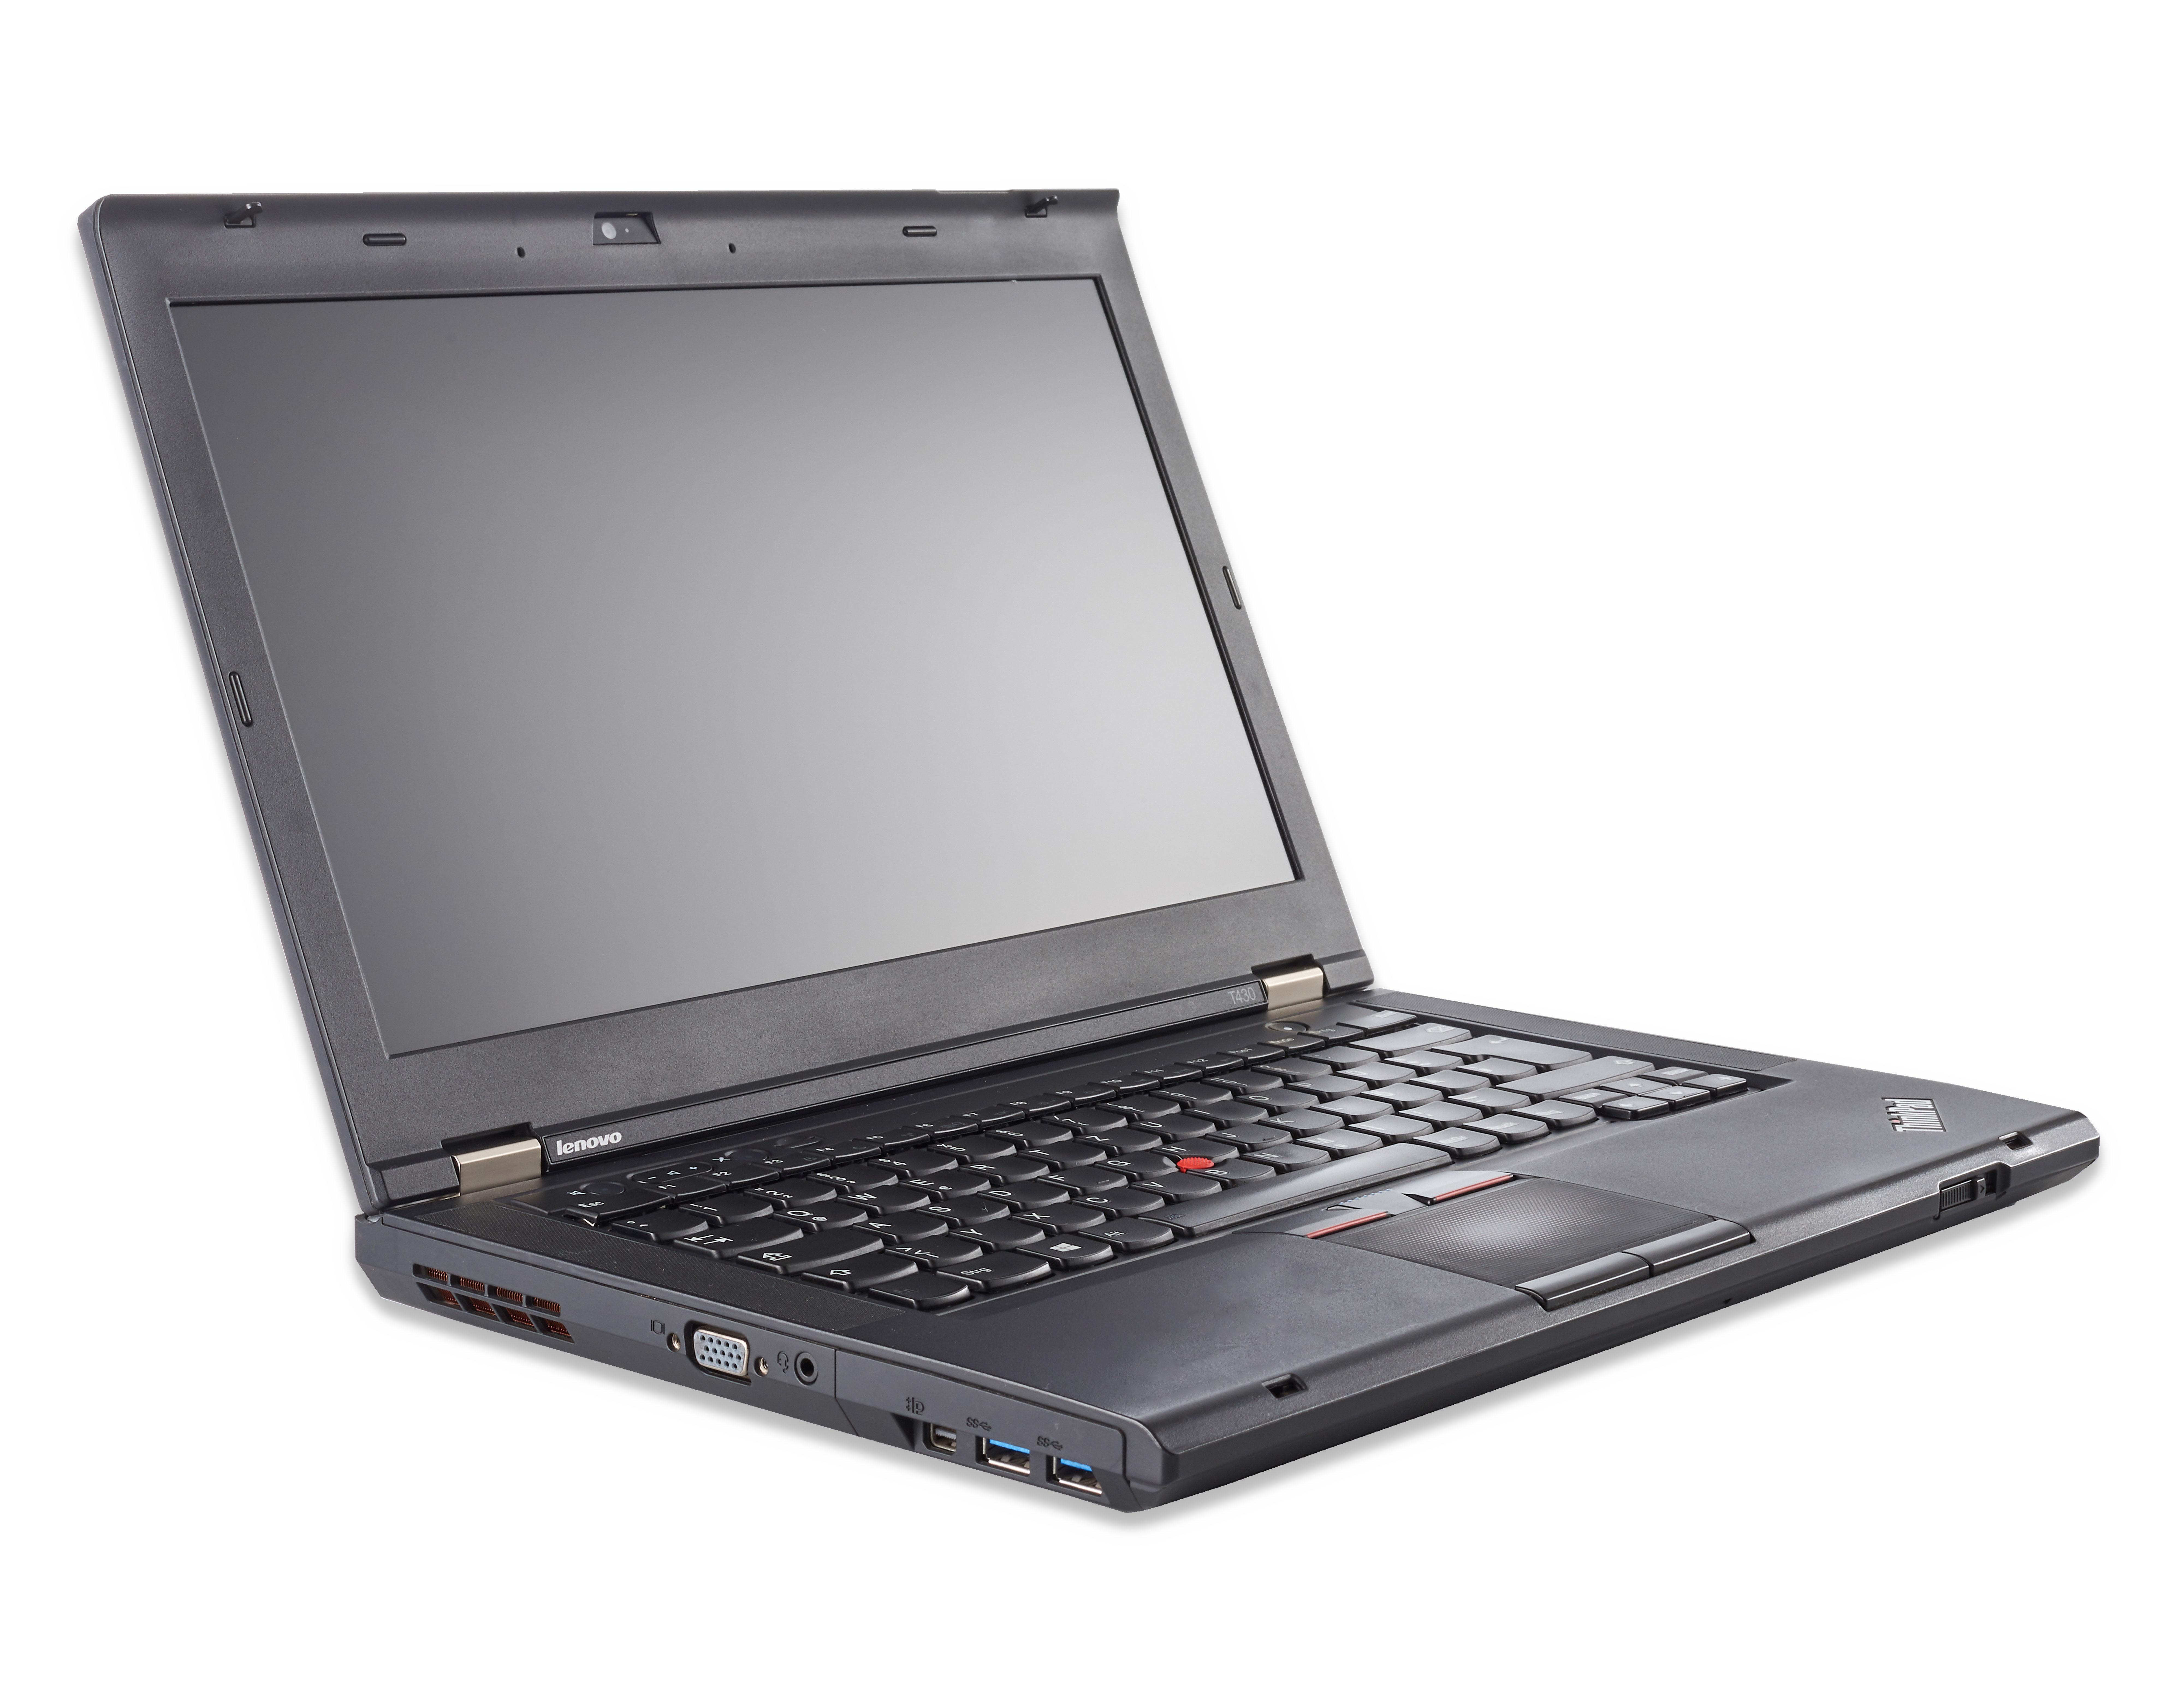 Fabriksnye Lenovo ThinkPad T430 - 14,0 Zoll - Core i5-3320M @ 2,6 GHz - 8GB YA-81